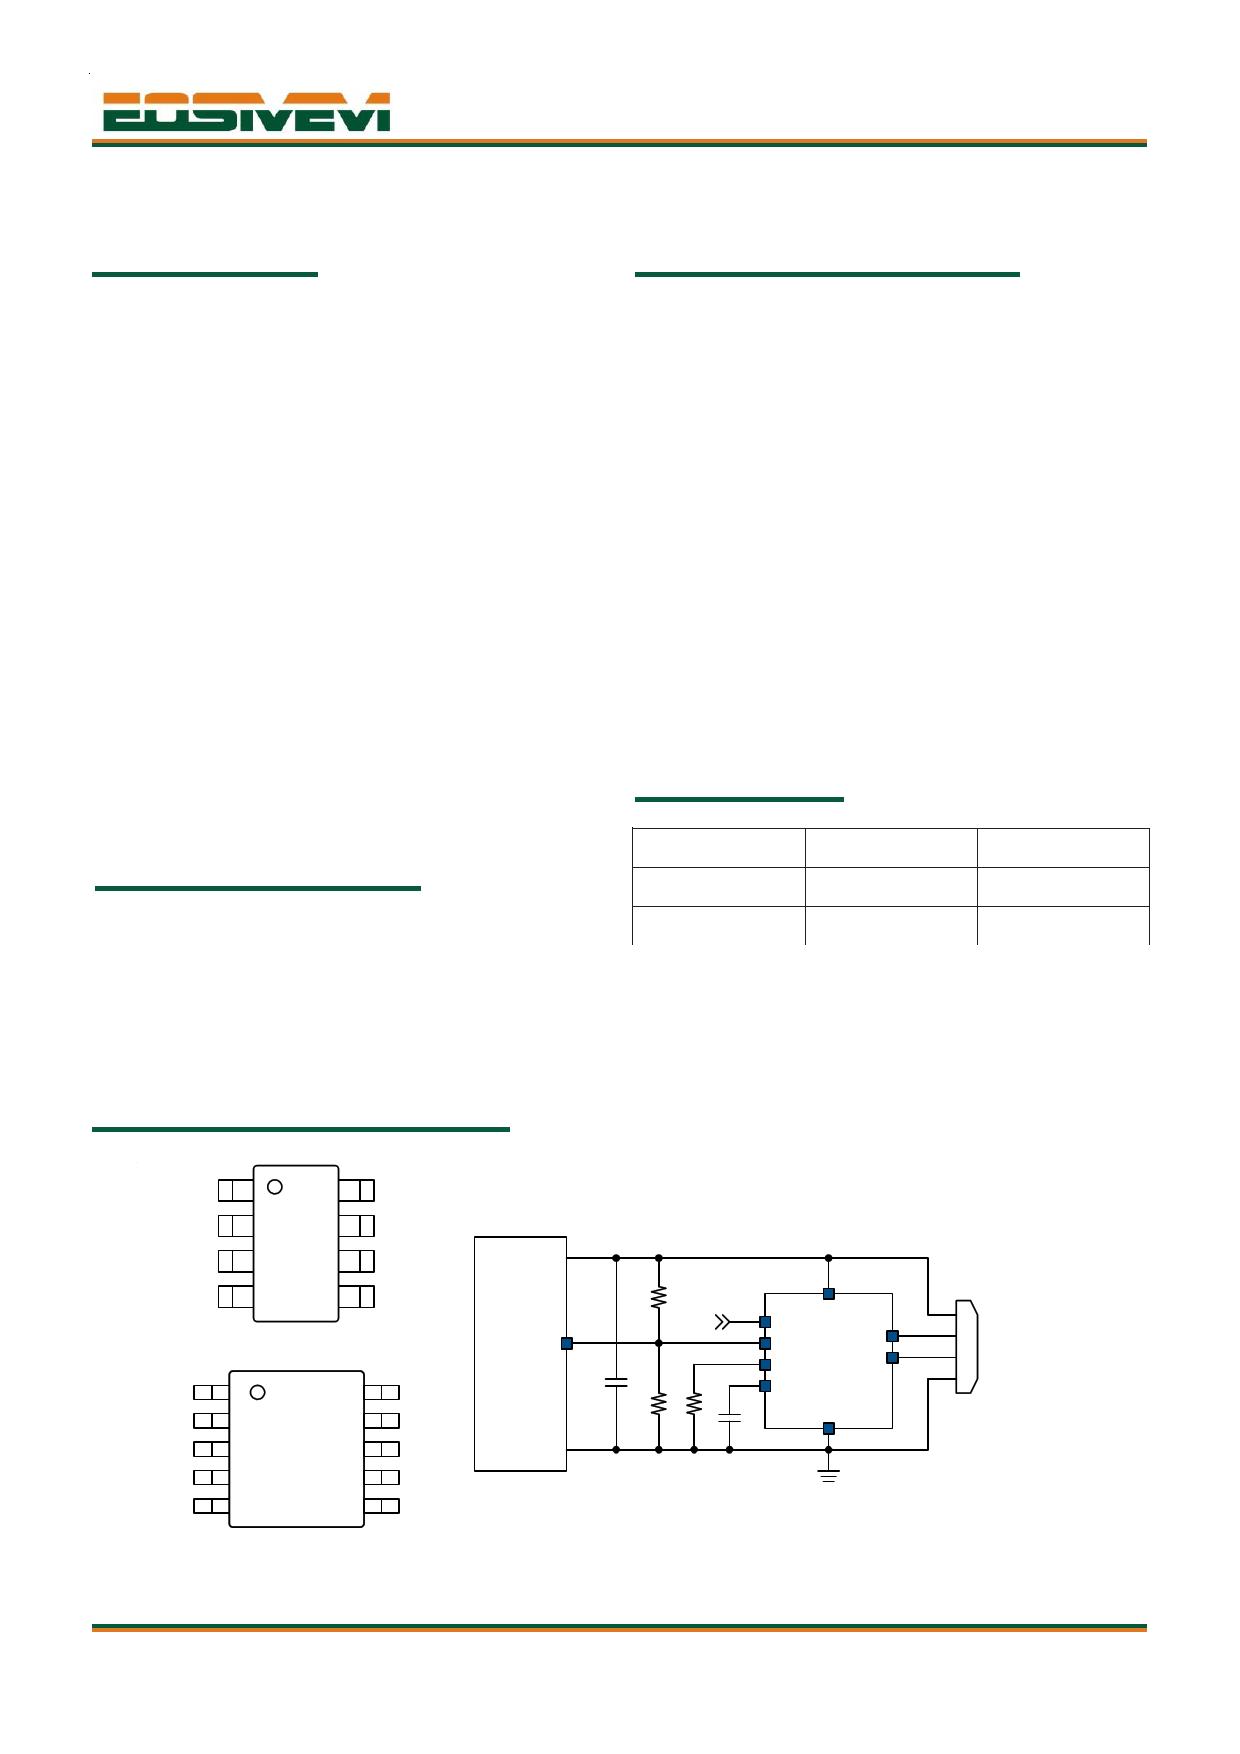 NT6008A 데이터시트 및 NT6008A PDF